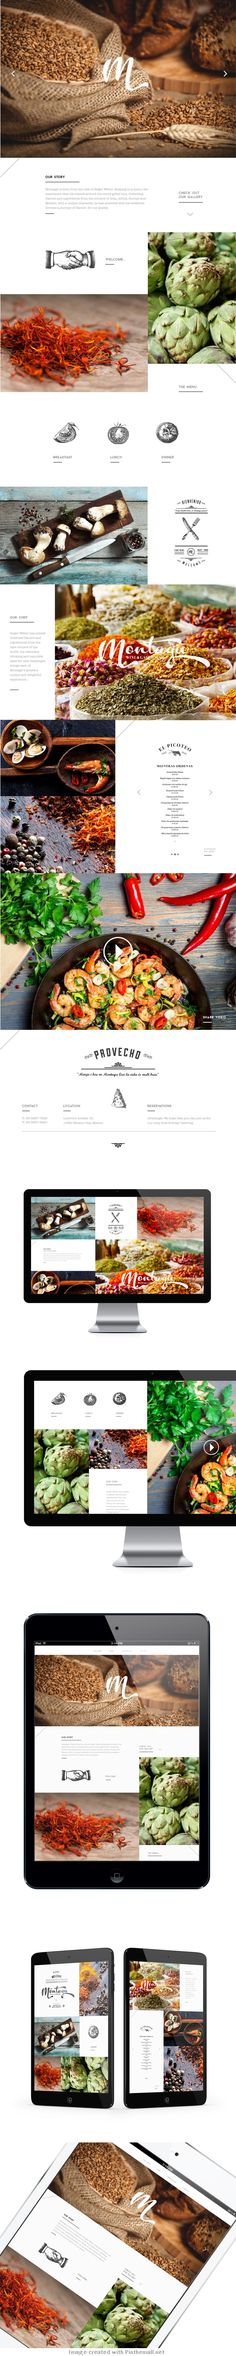 Beautiful Branding for Spanish-Mexican Restaurant Montagu